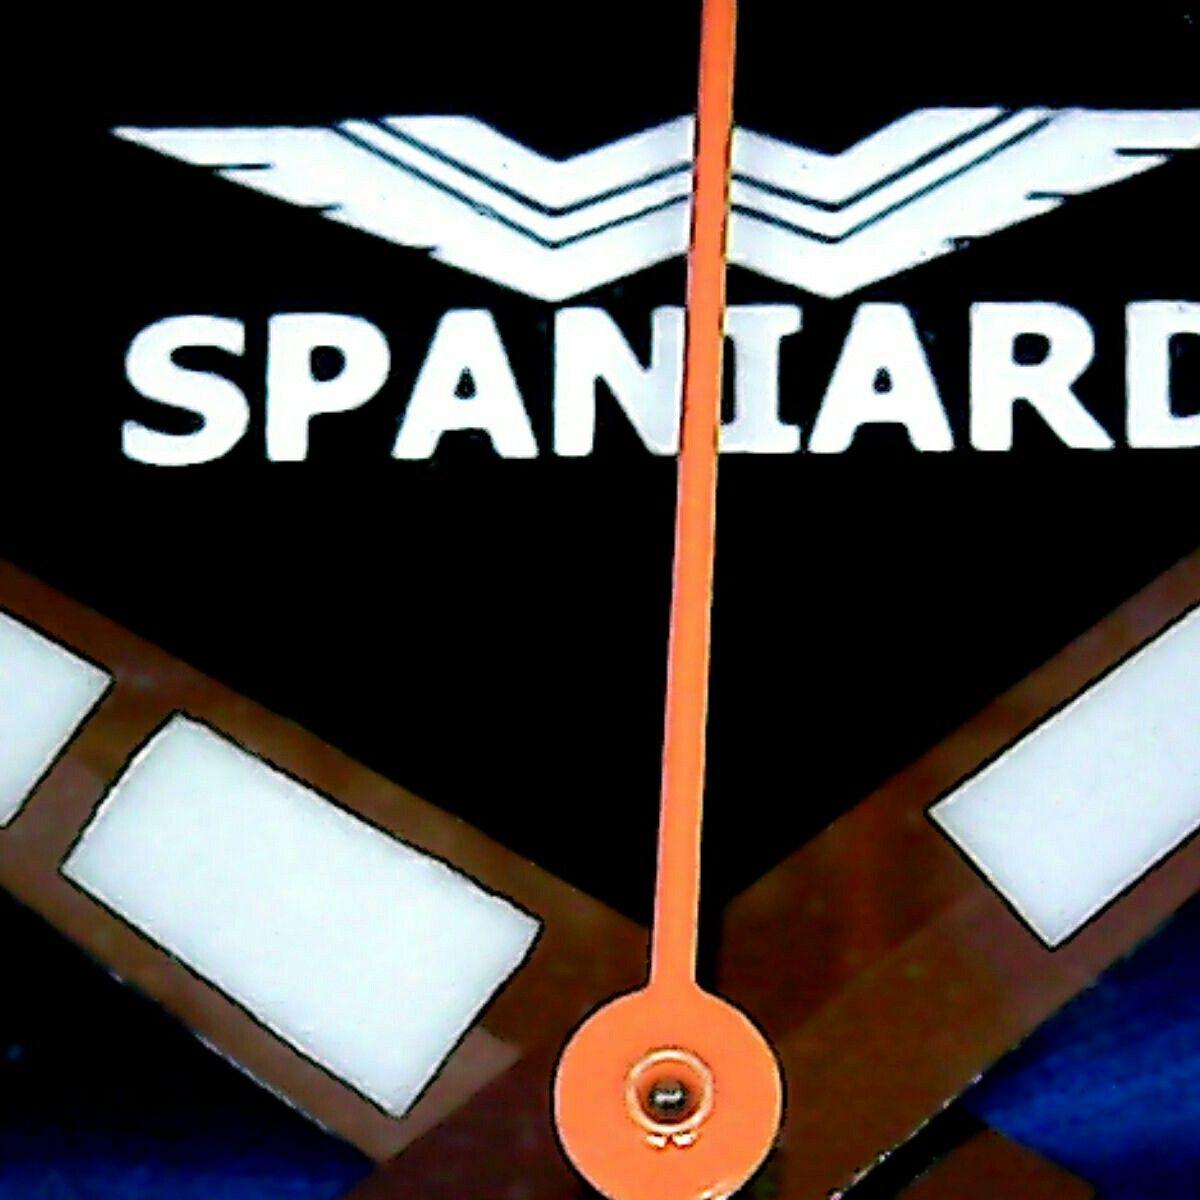 SPANIARD BMW 56535d600fe07e99f39c007f9853f2ac